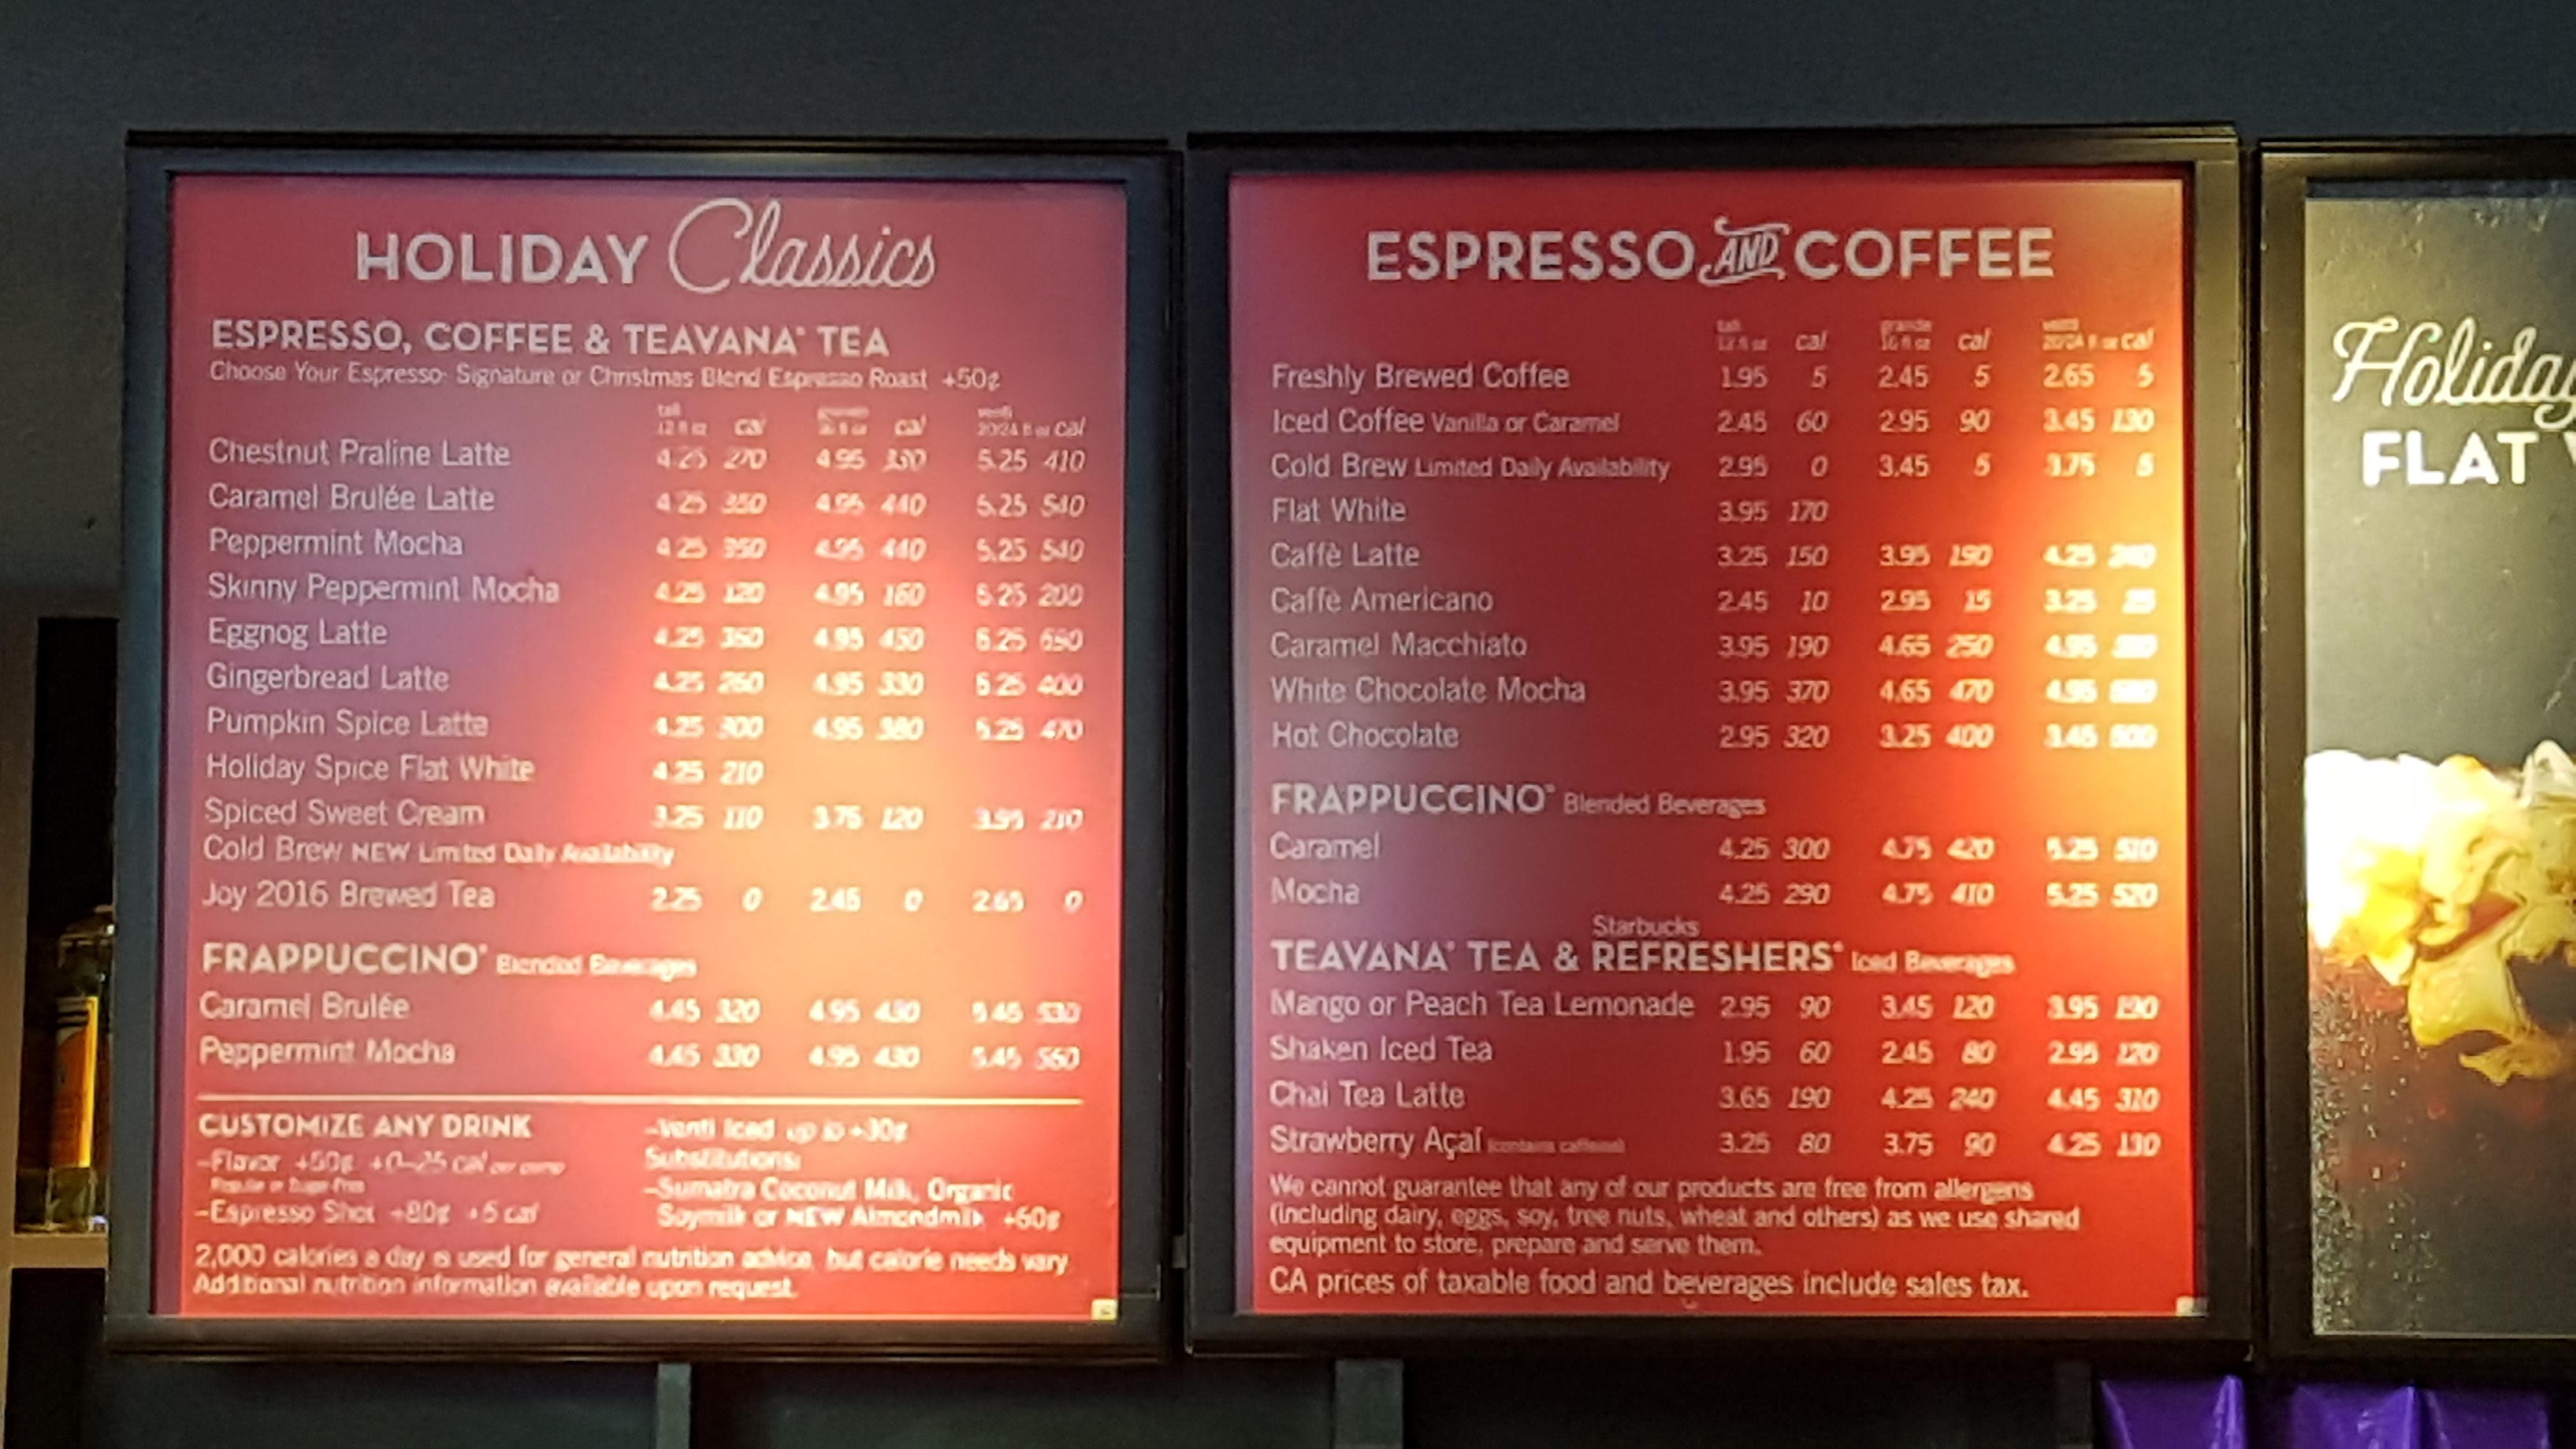 caffe americano, Size, tall size, [산호세] 미국스타벅스를 체험해 봤네융, 가격, 가격 차이, 건강한 맛, 과일 음료, 노트북족, 녹즙, 땅값, 메뉴, 메뉴판, 미국 노트북 죽돌이, 미국 노트북 카페, 미국 노트북족, 미국 스타벅스, 미국 스타벅스 가격, 미국 스타벅스 비교, 미국 스타벅스 체험, 분위기, 블루베리 요거트, 빵, 산호세, 샌드위치, 샐러드, 스낵, 스타벅스 굿스, 스타벅스 궂즈, 스타벅스 텀블러, 시리얼, 아메리카노, 아메리카노 가격, 애플 제품, 요거트, 음료, 임대료, 저렴, 조각 케익, 죽돌이, 커피, 케이크, 케익